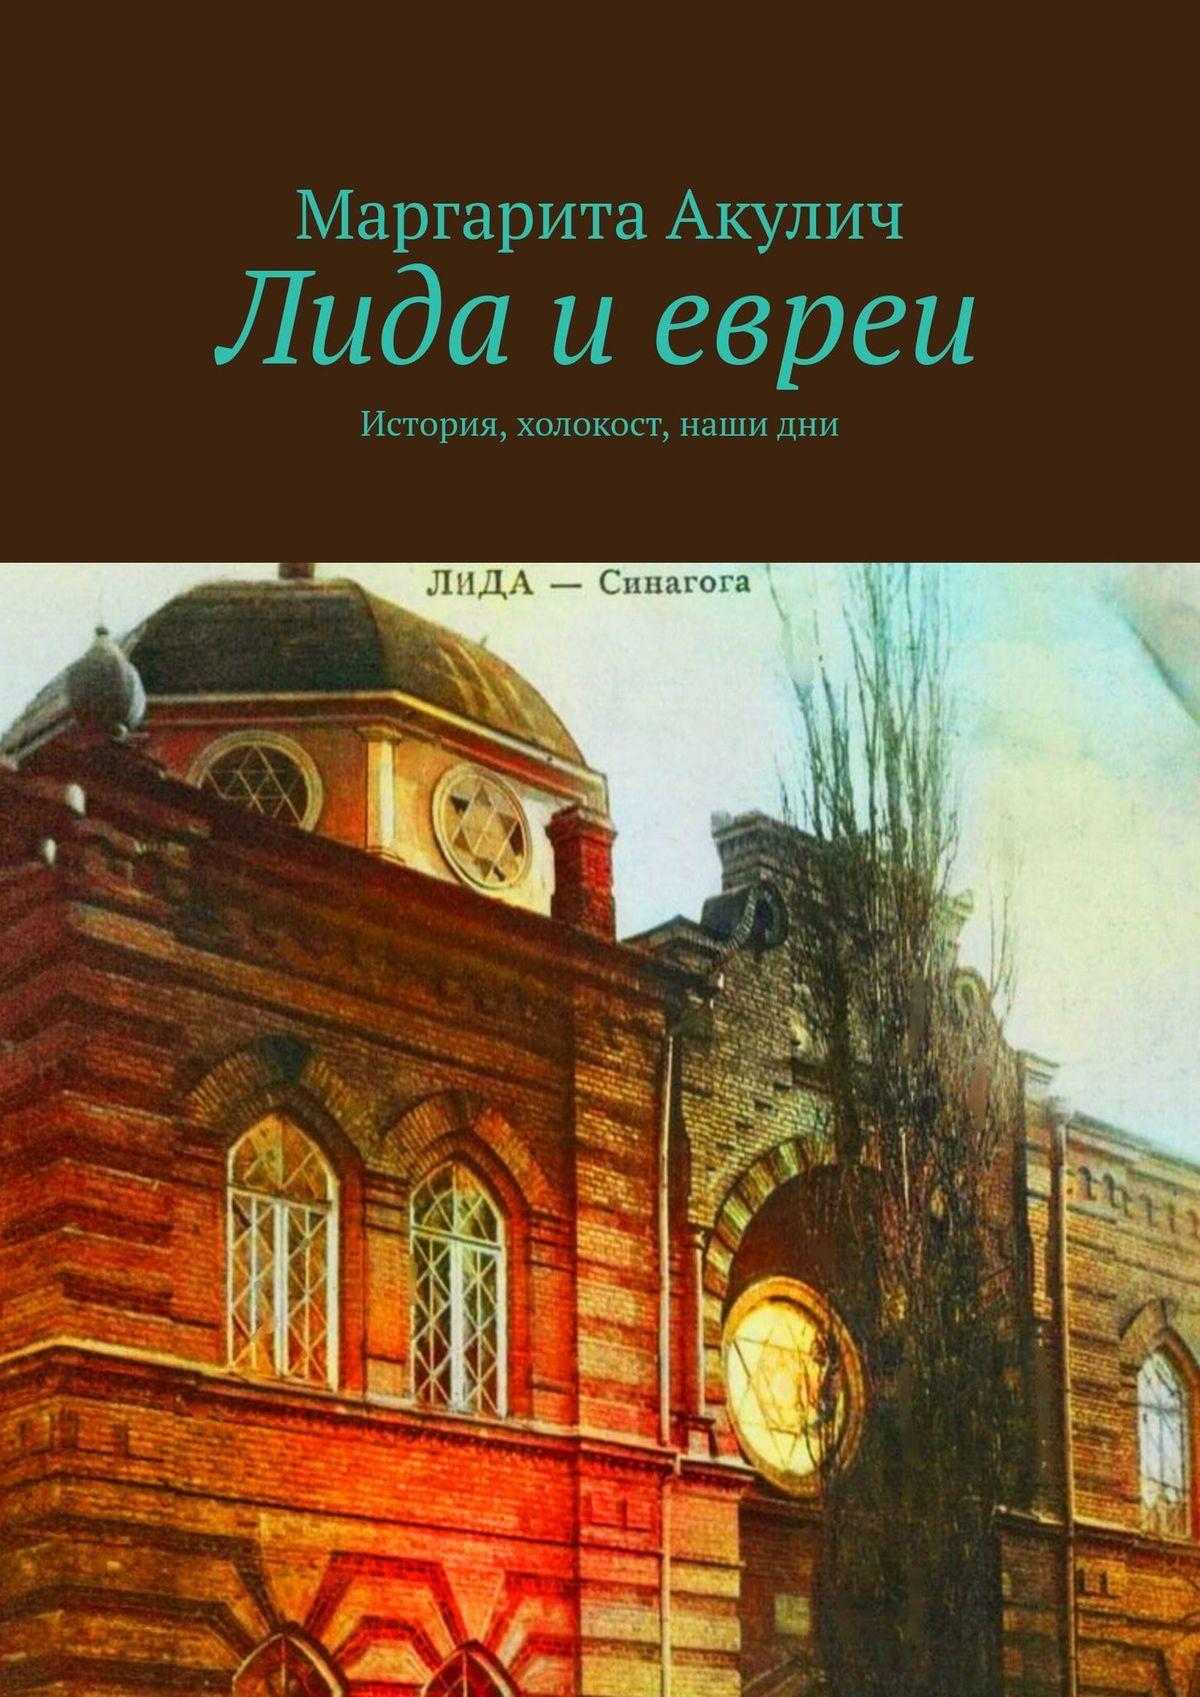 Маргарита Акулич Лида и евреи. История, холокост, наши дни недорого